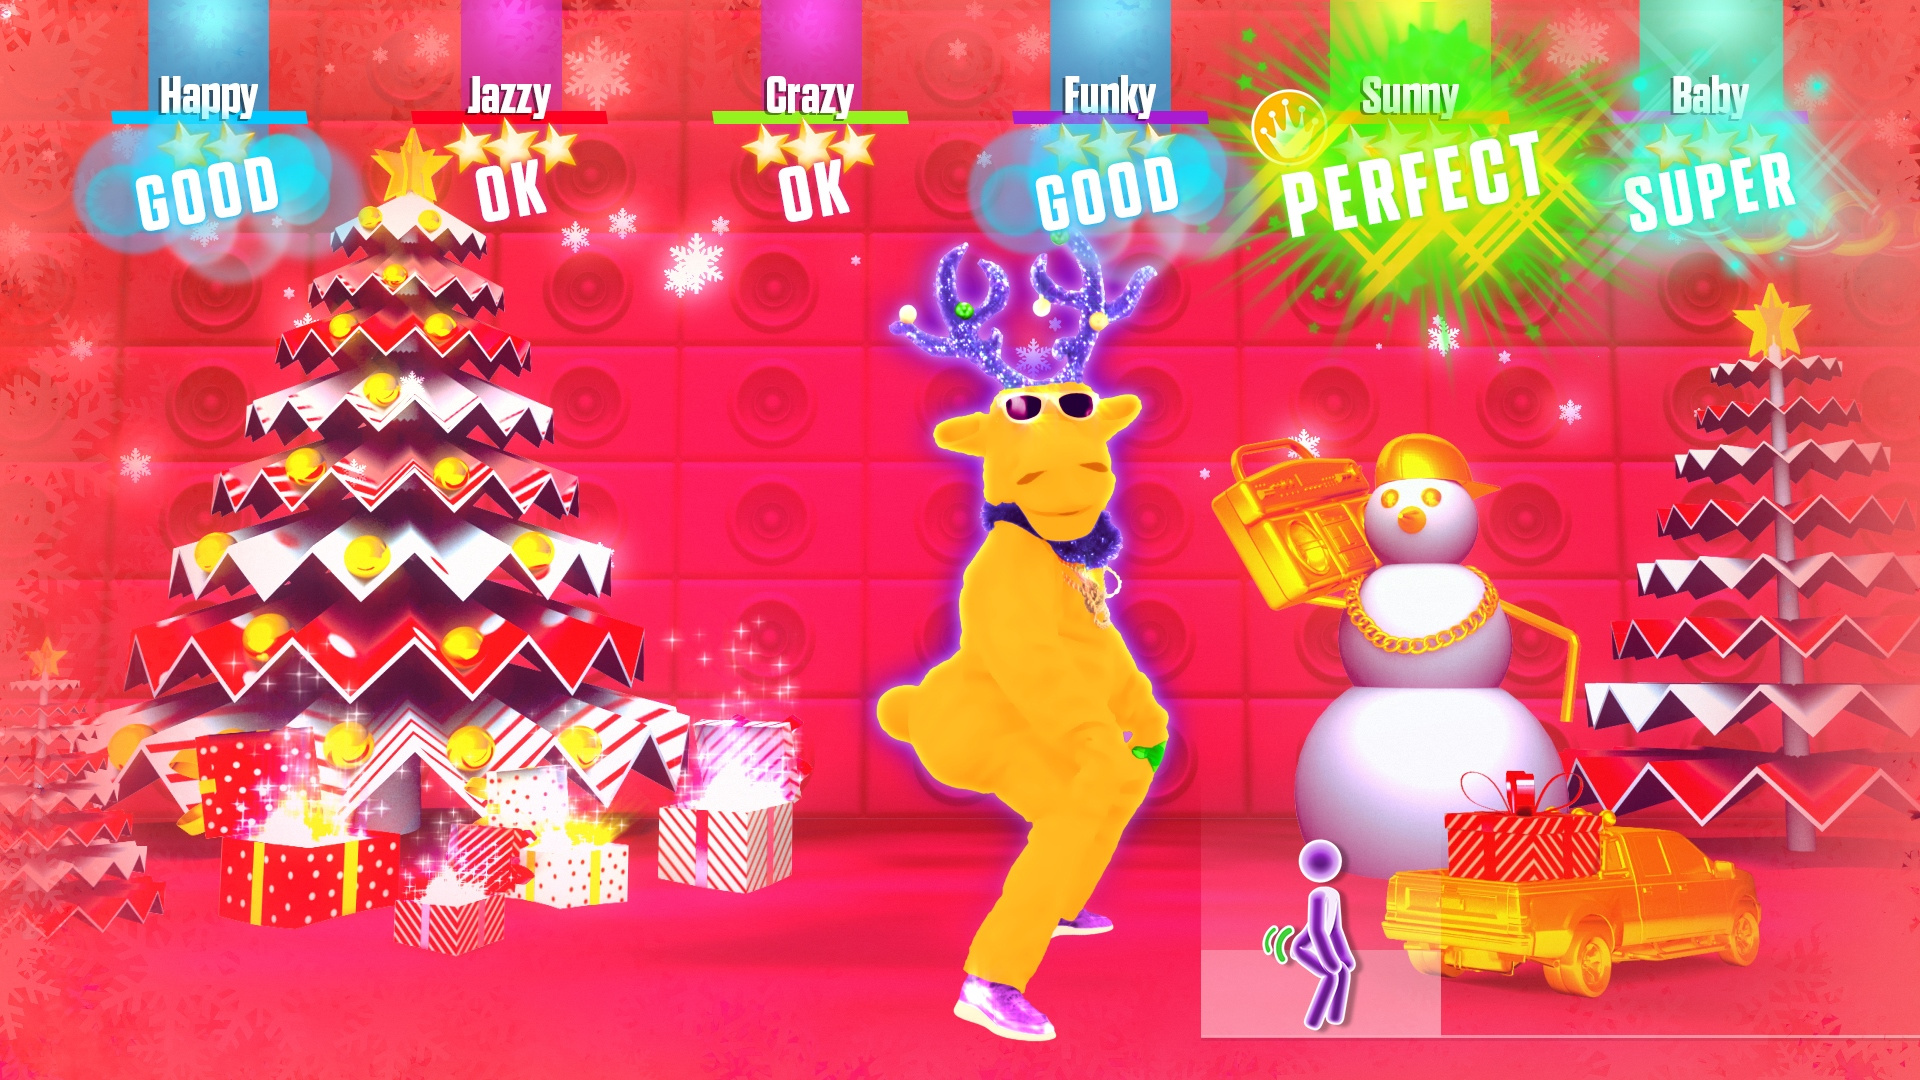 Just Dance 2018Screenshots (PS4 / PlayStation 4)